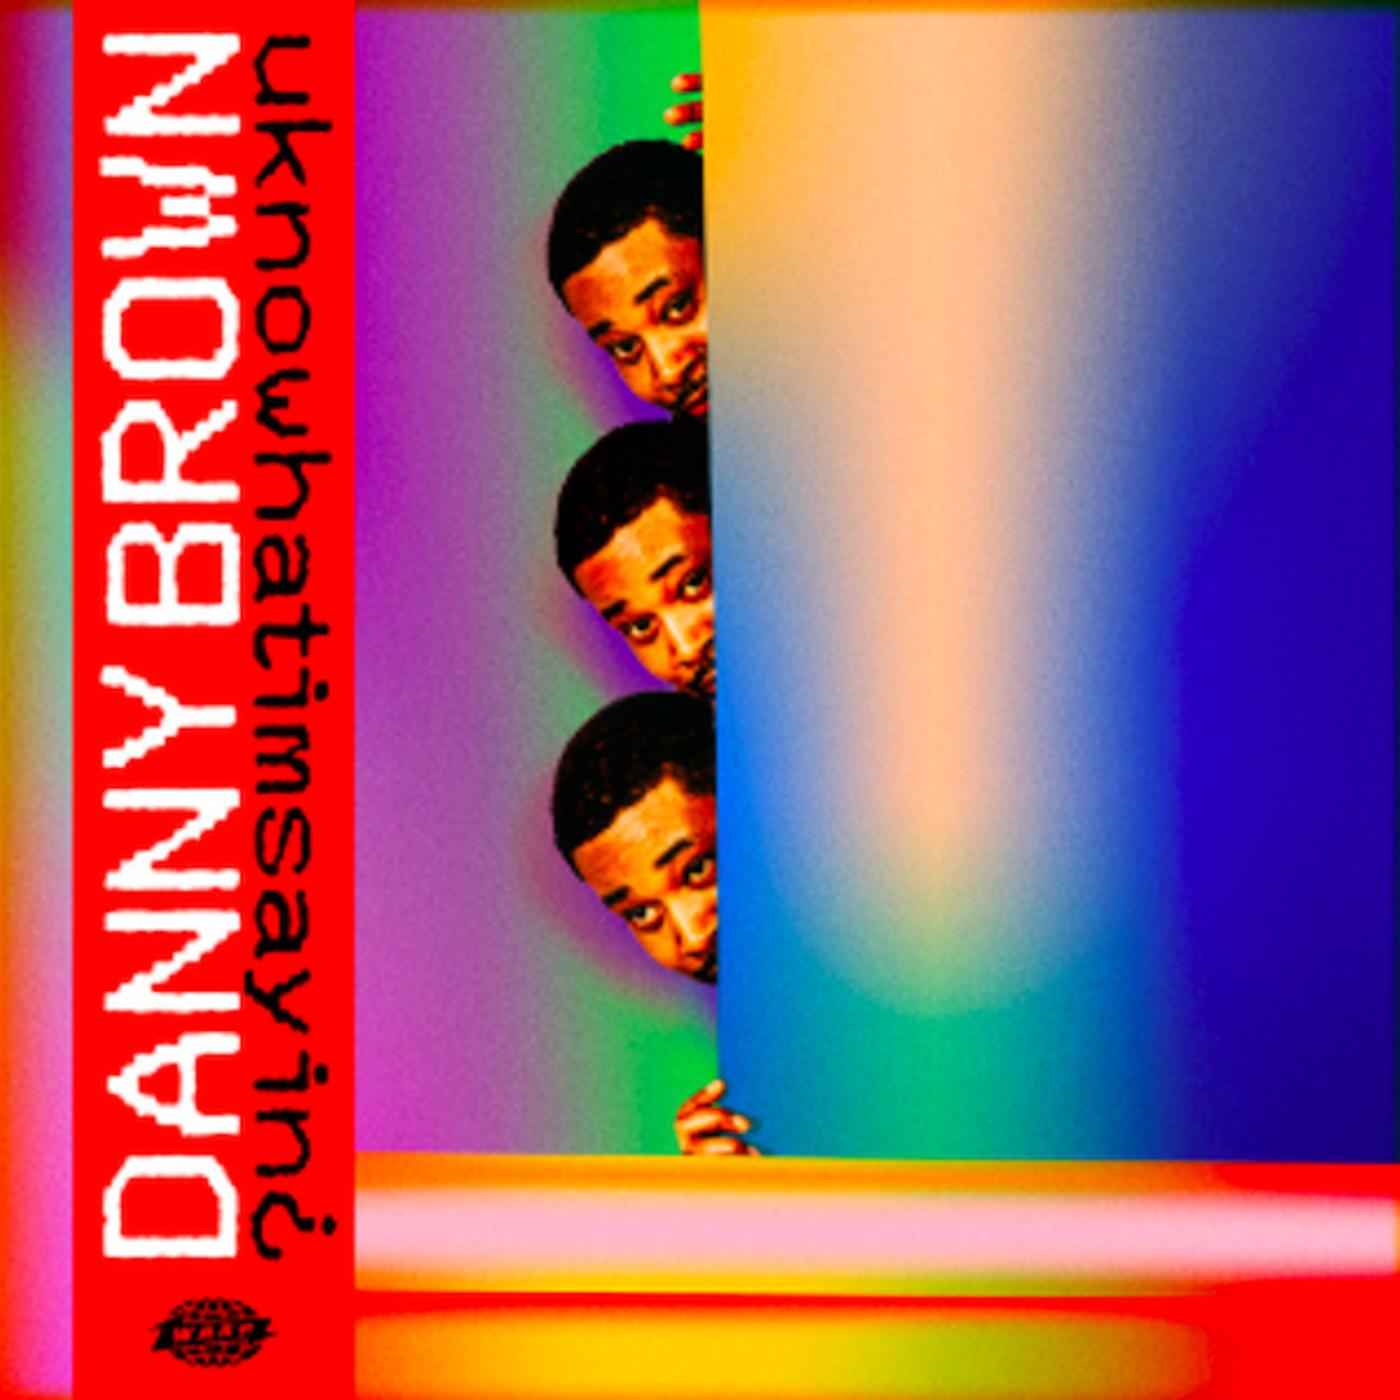 Danny Brown 'uknowhatimsayin'